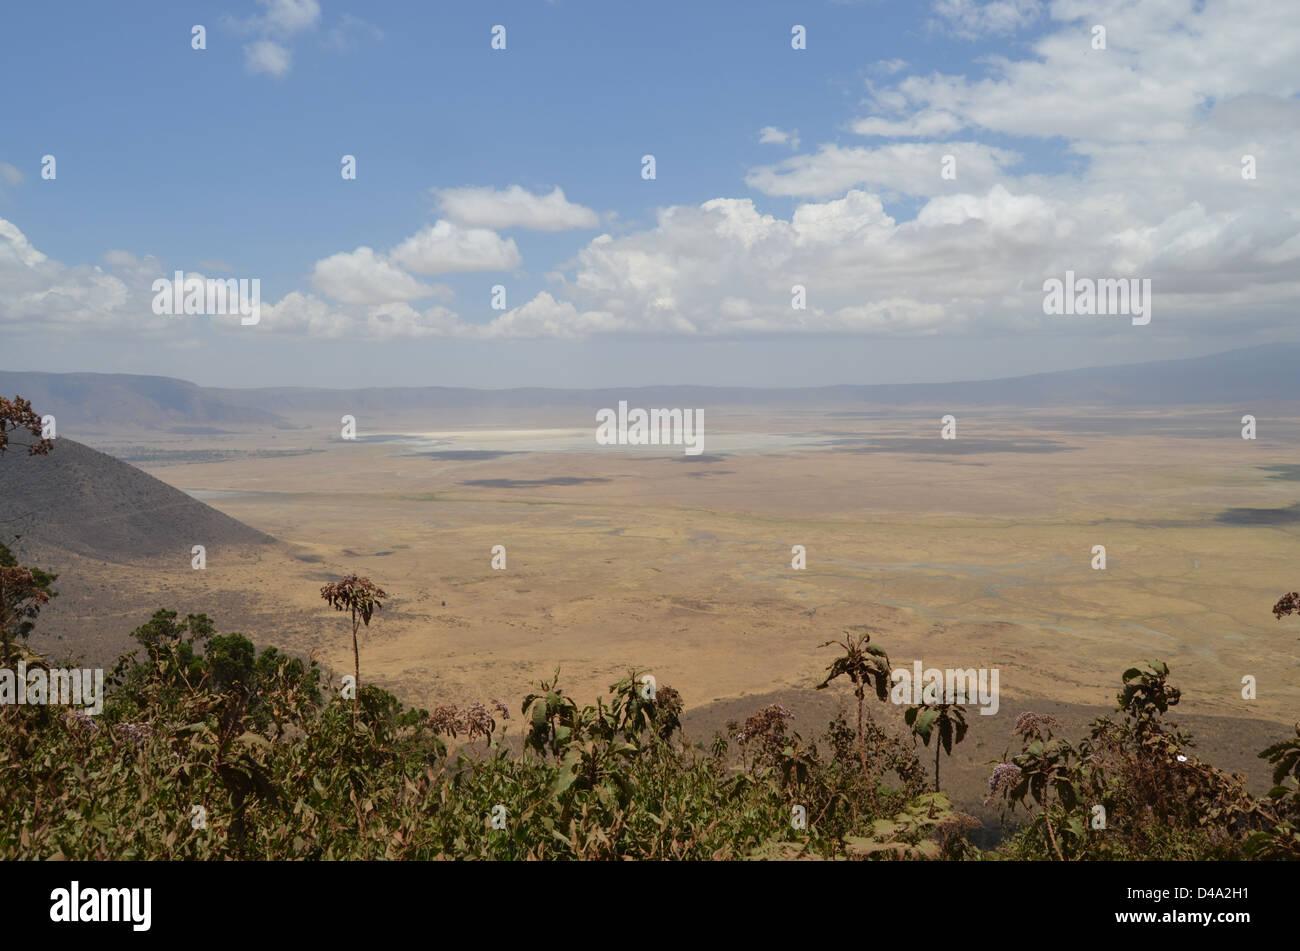 A view of the Ngorogoro Crater interior, Tanzania Stock Photo